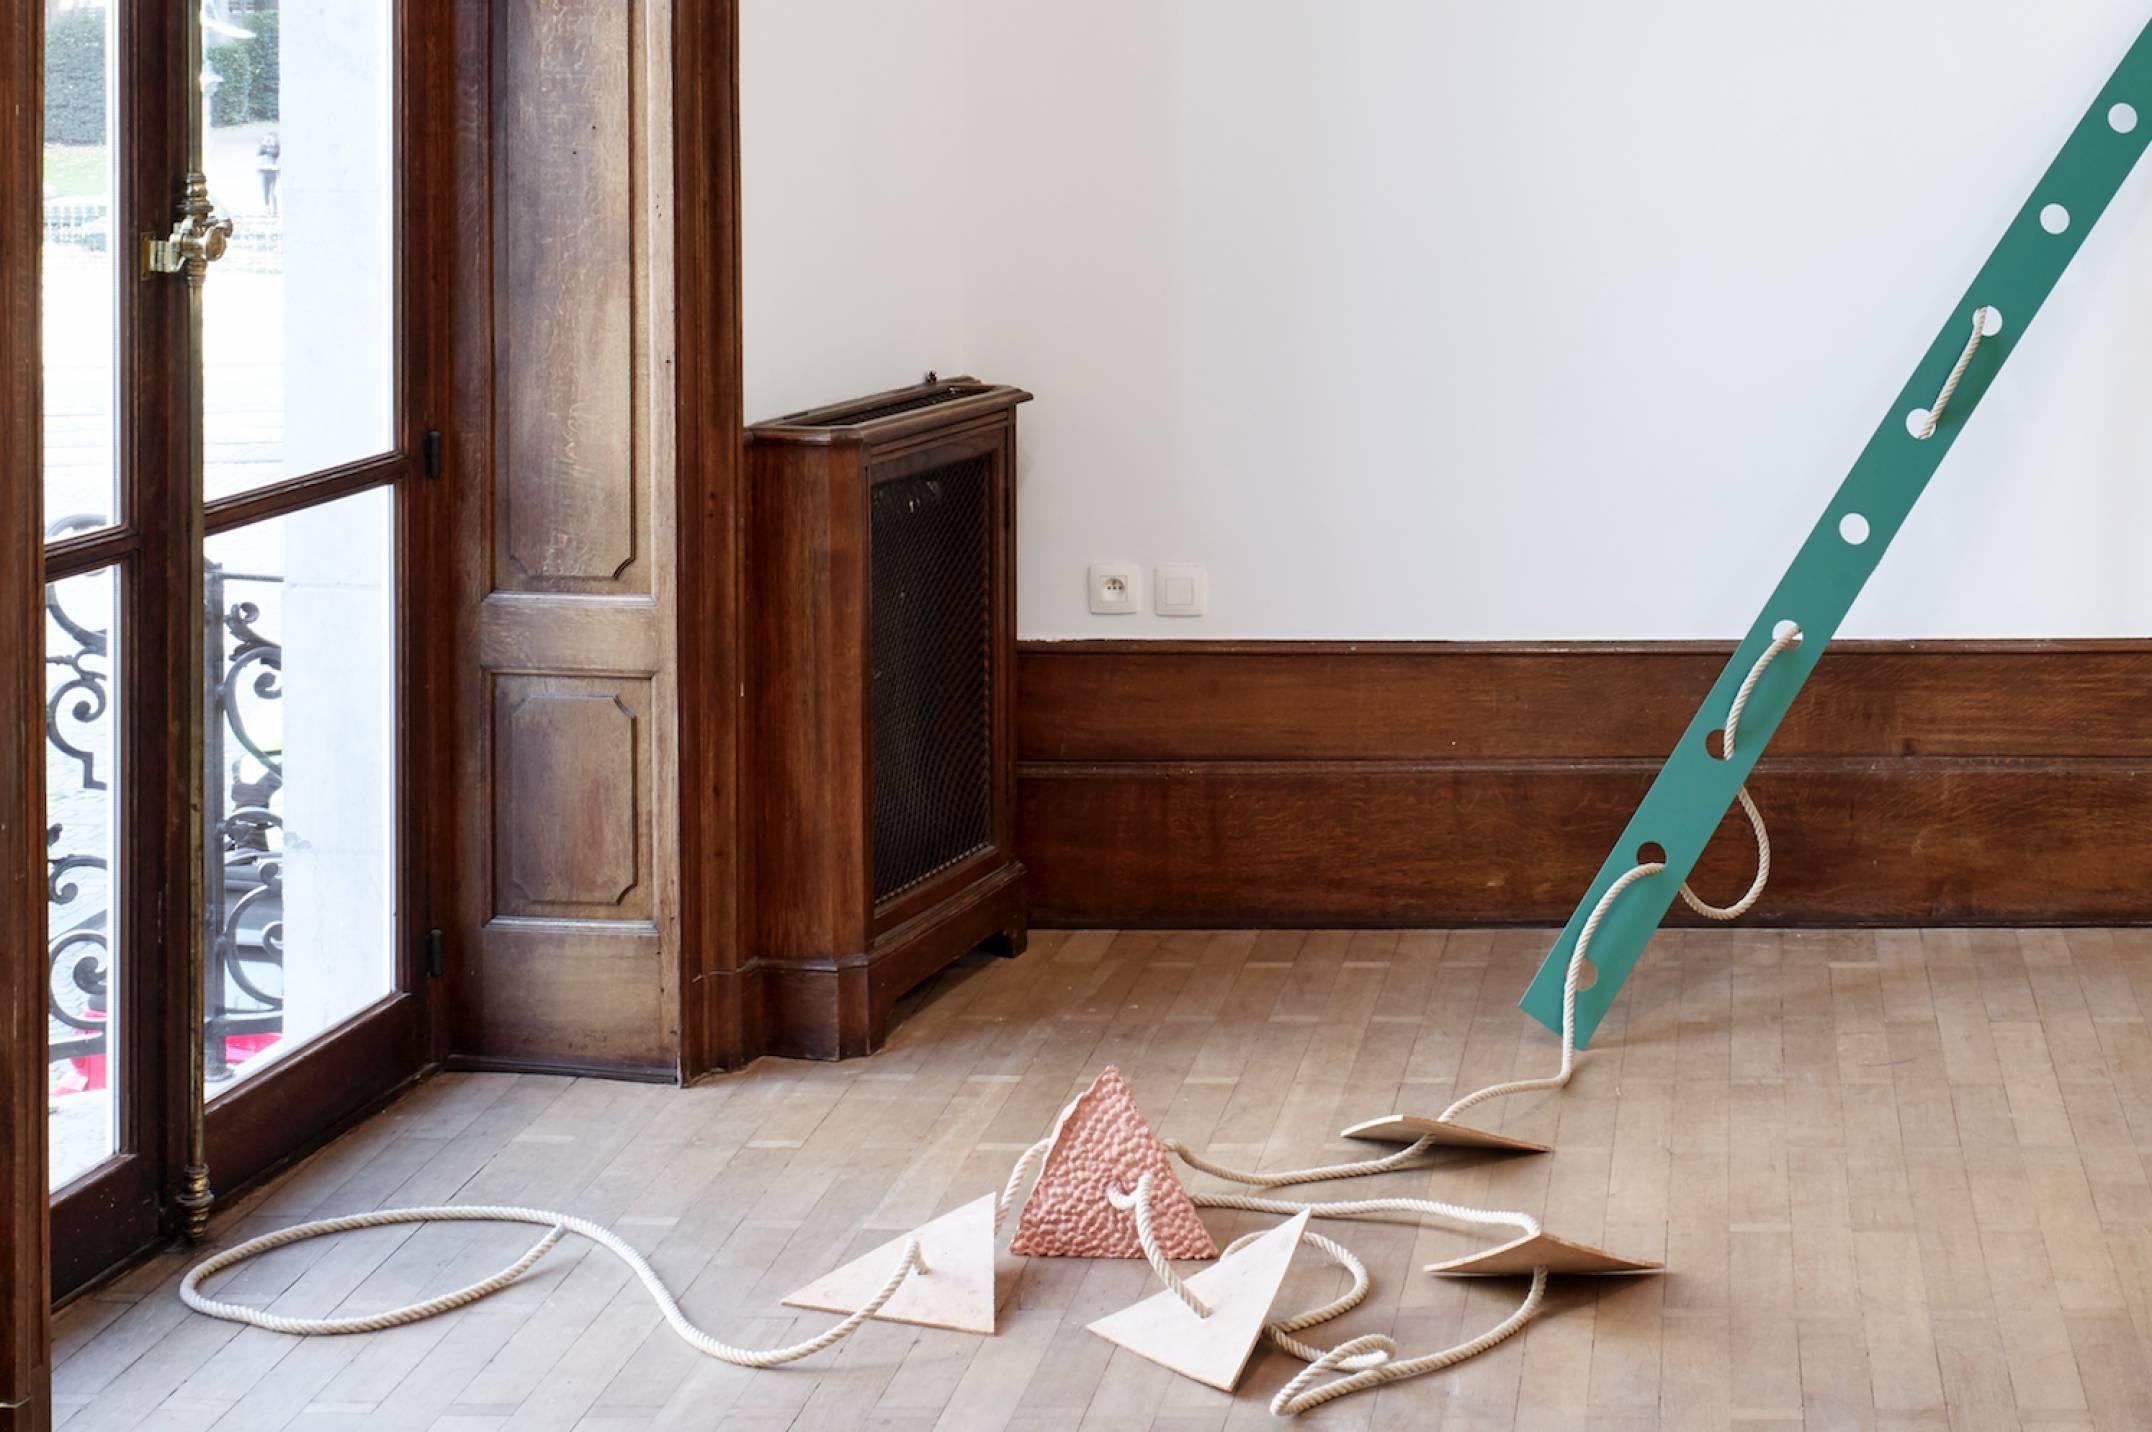 Mariana Castillo Deball, <em>Xipe Tetrahedron I, </em>2017, pigmented plaster and hemp rope, 280 × 180 cm - Mendes Wood DM